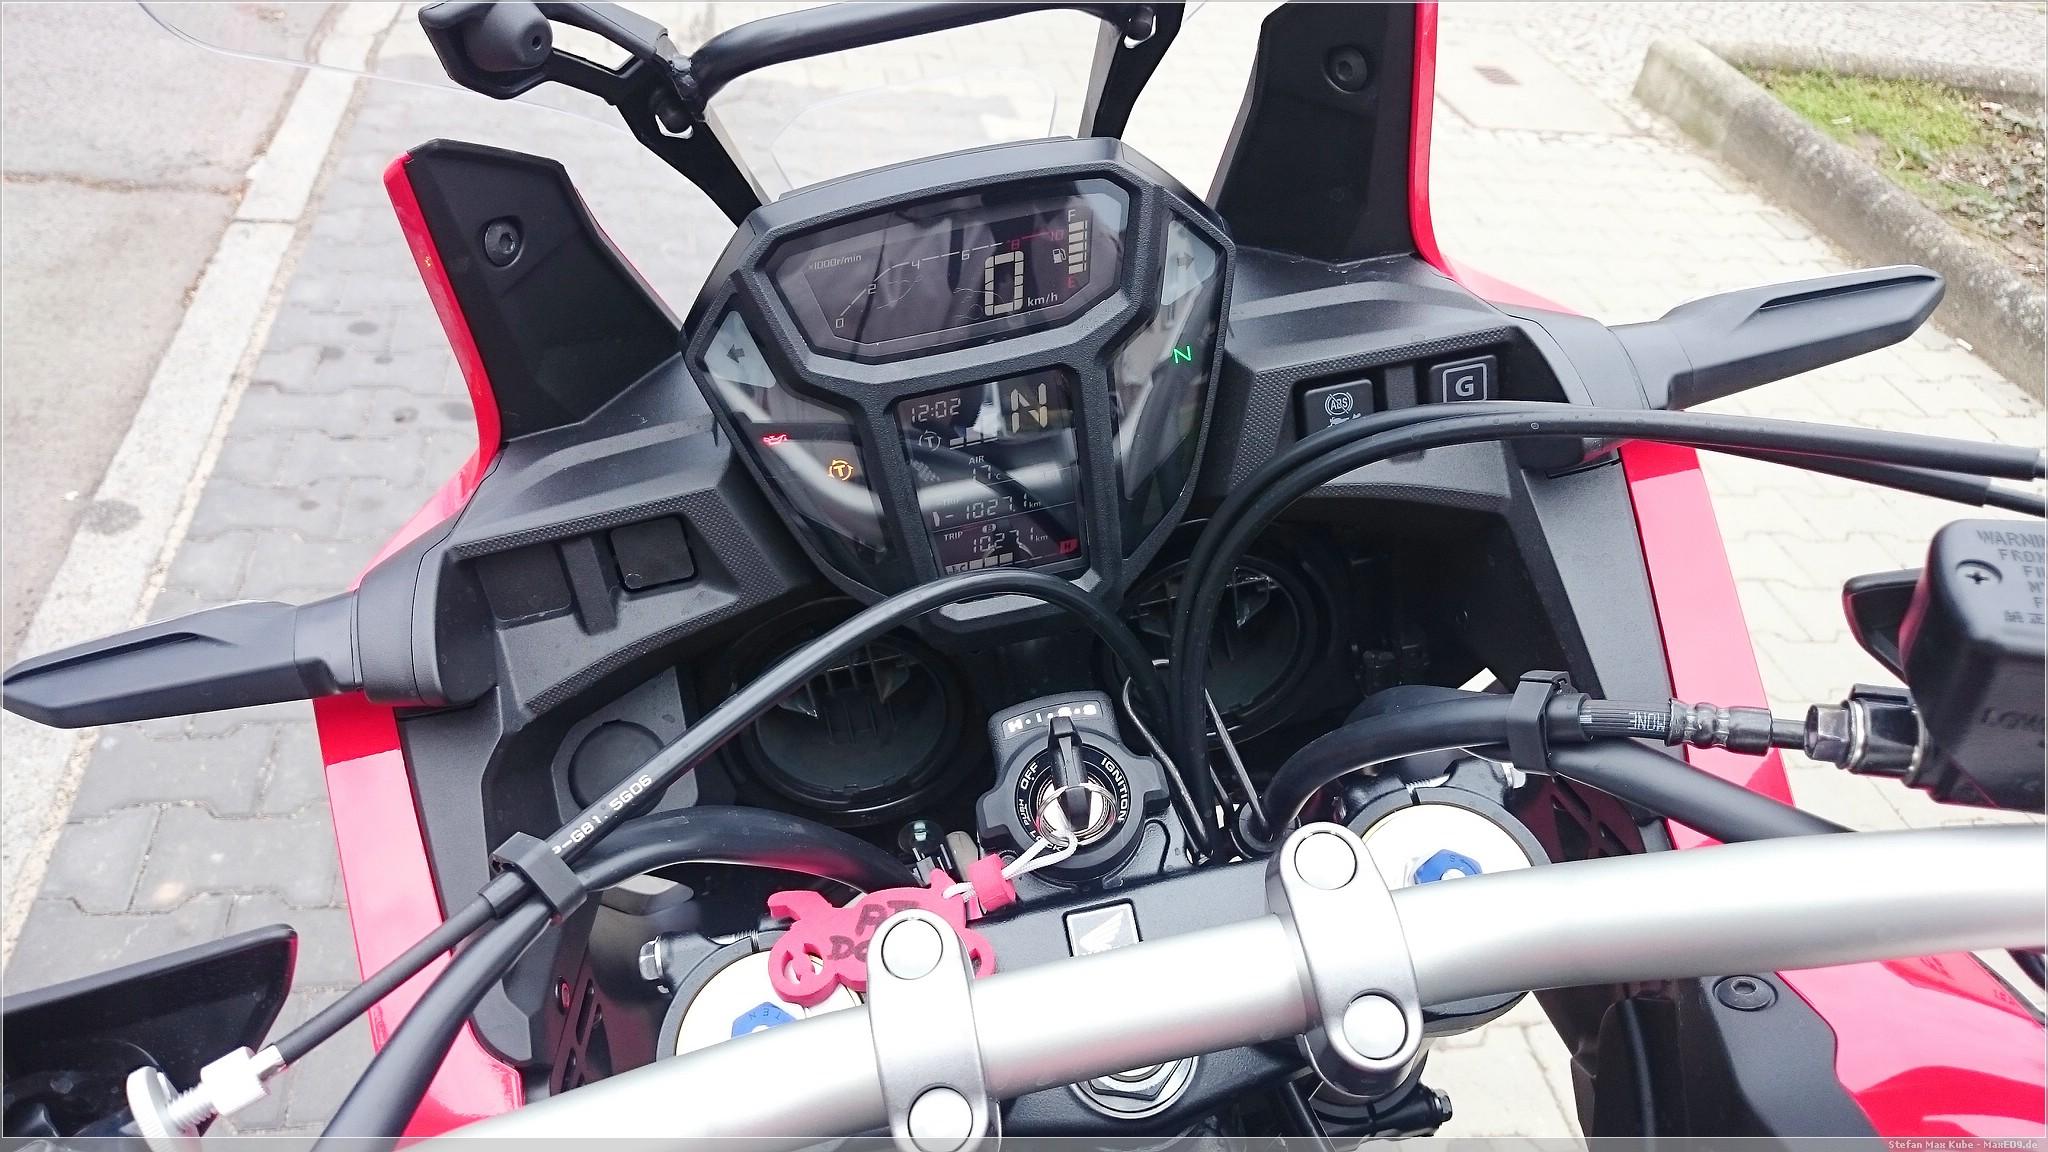 Honda Africa Twin DCT Cockpit